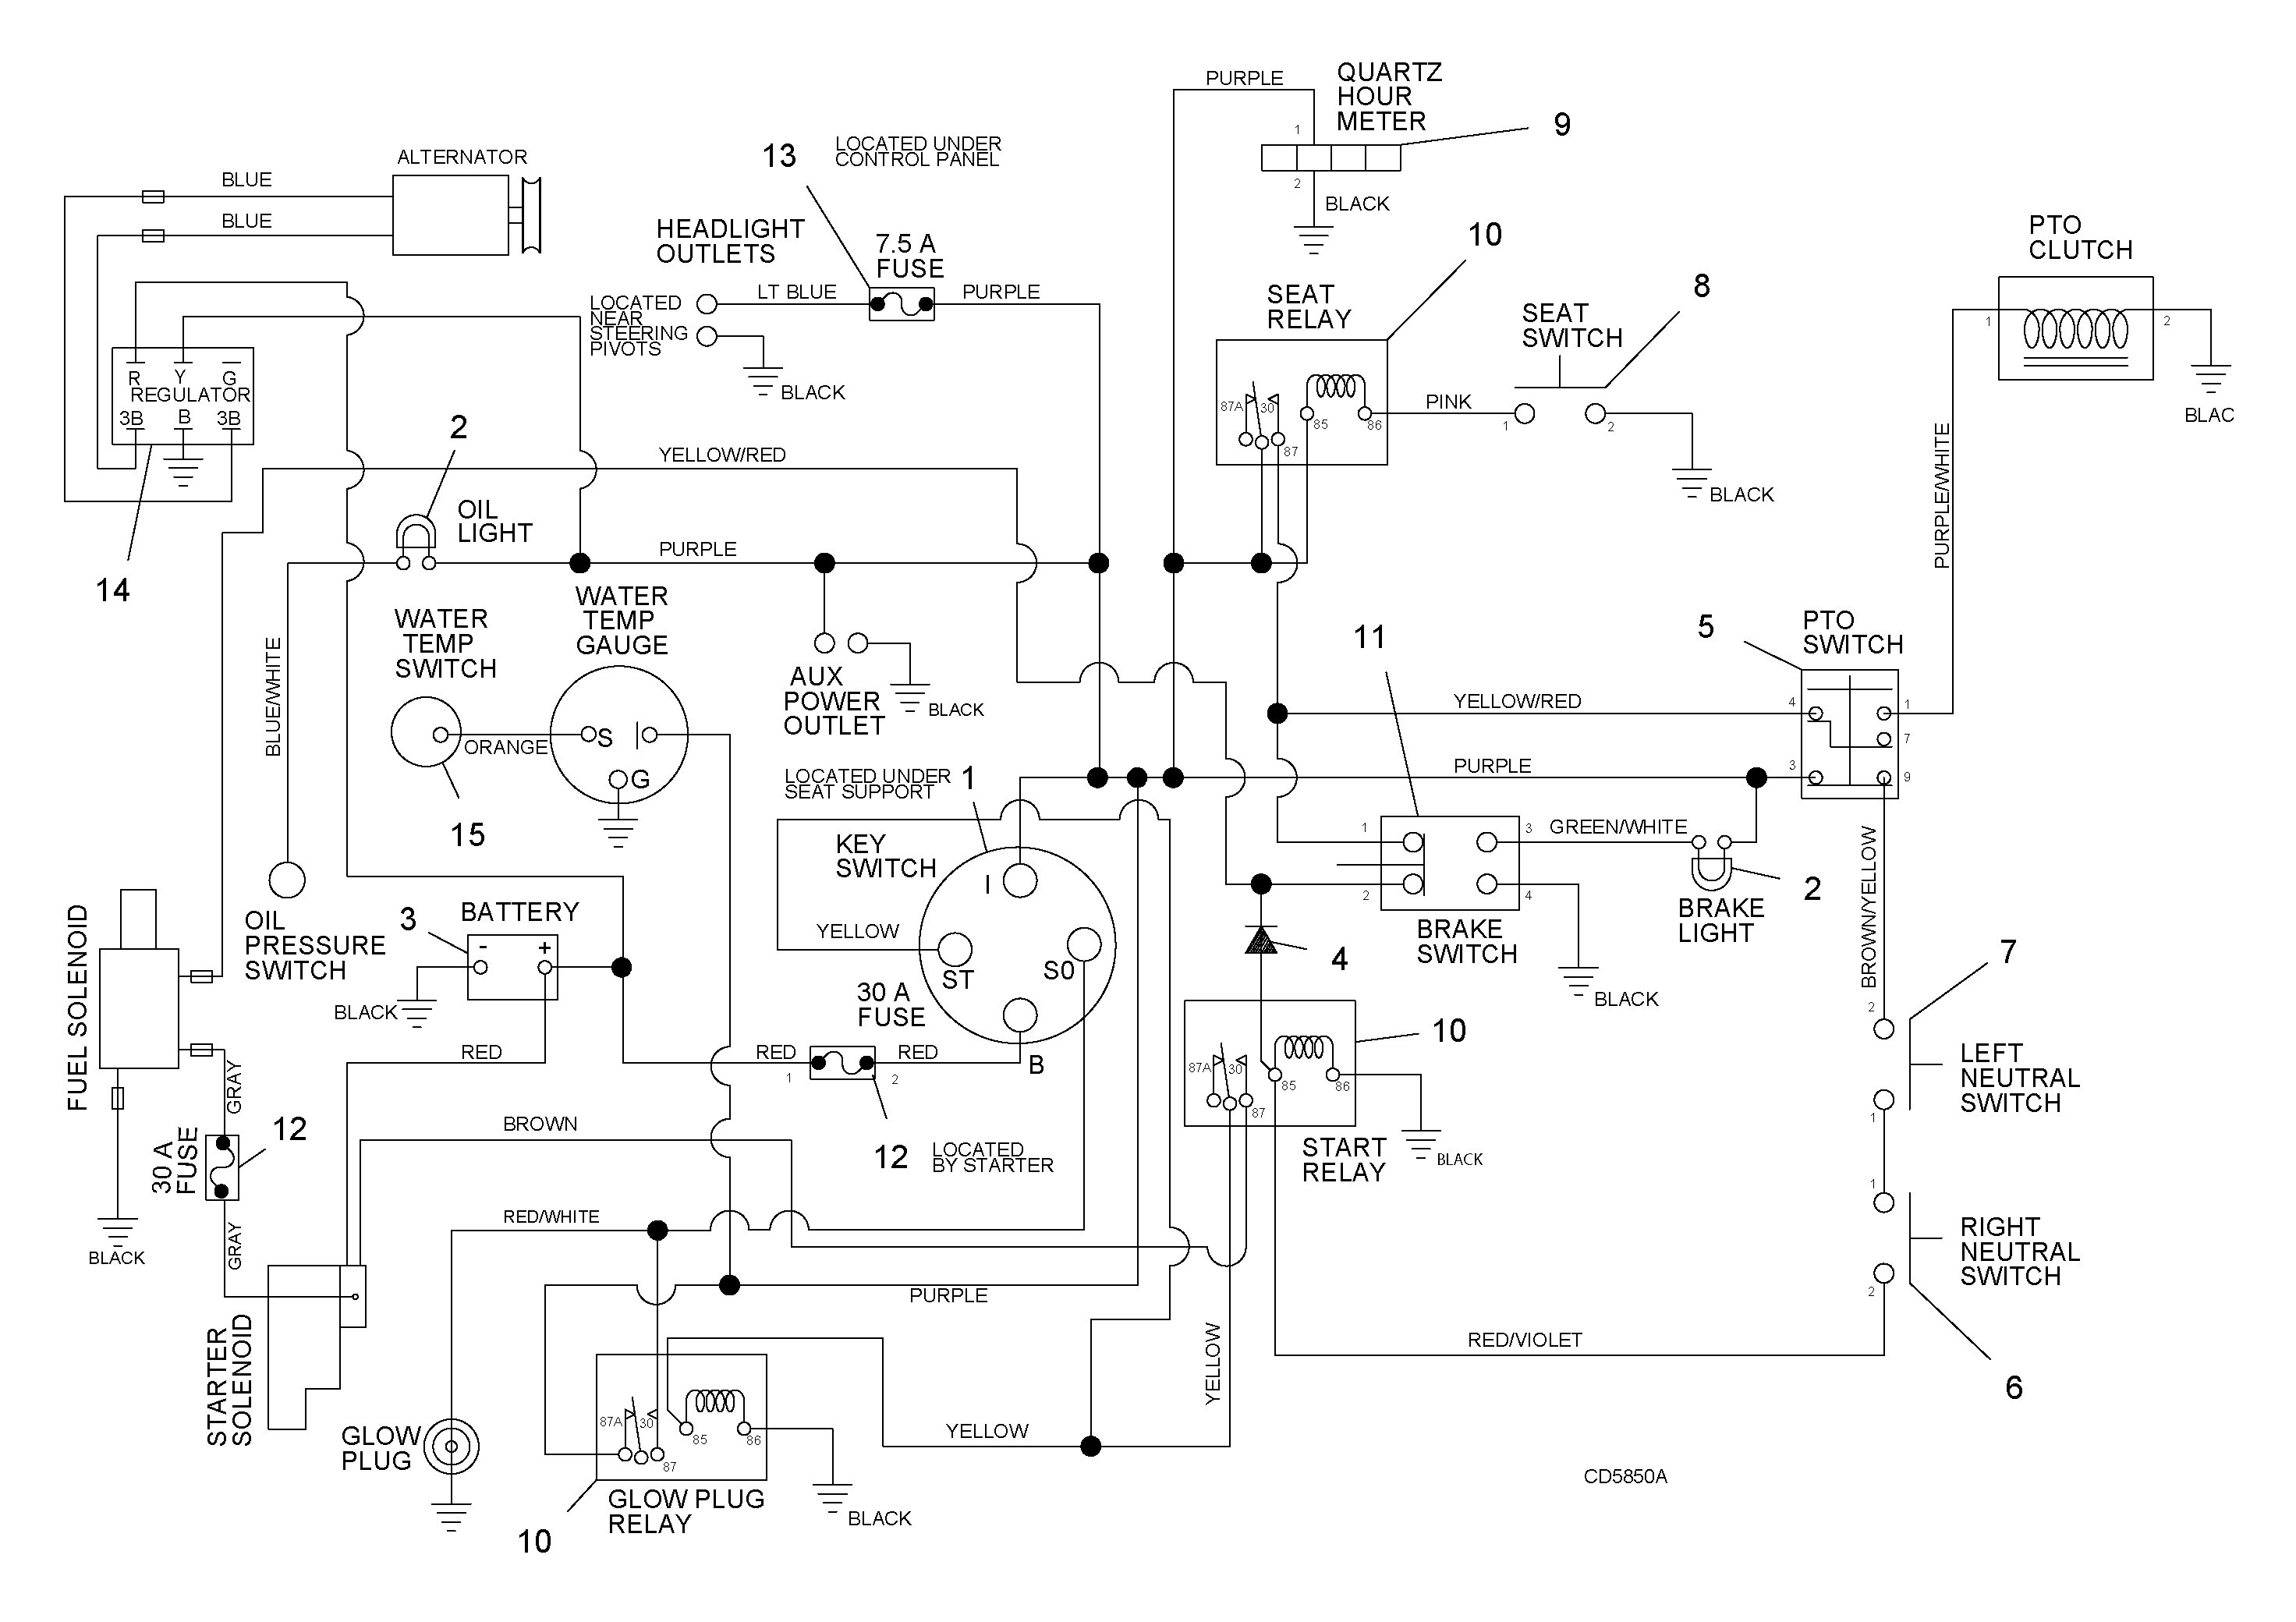 Kubota Glow Plug Wiring Diagram Image 1985 Chevy Yanmar Alternator Fresh Atemberaubend Starter Schaltplan Bilder Serie